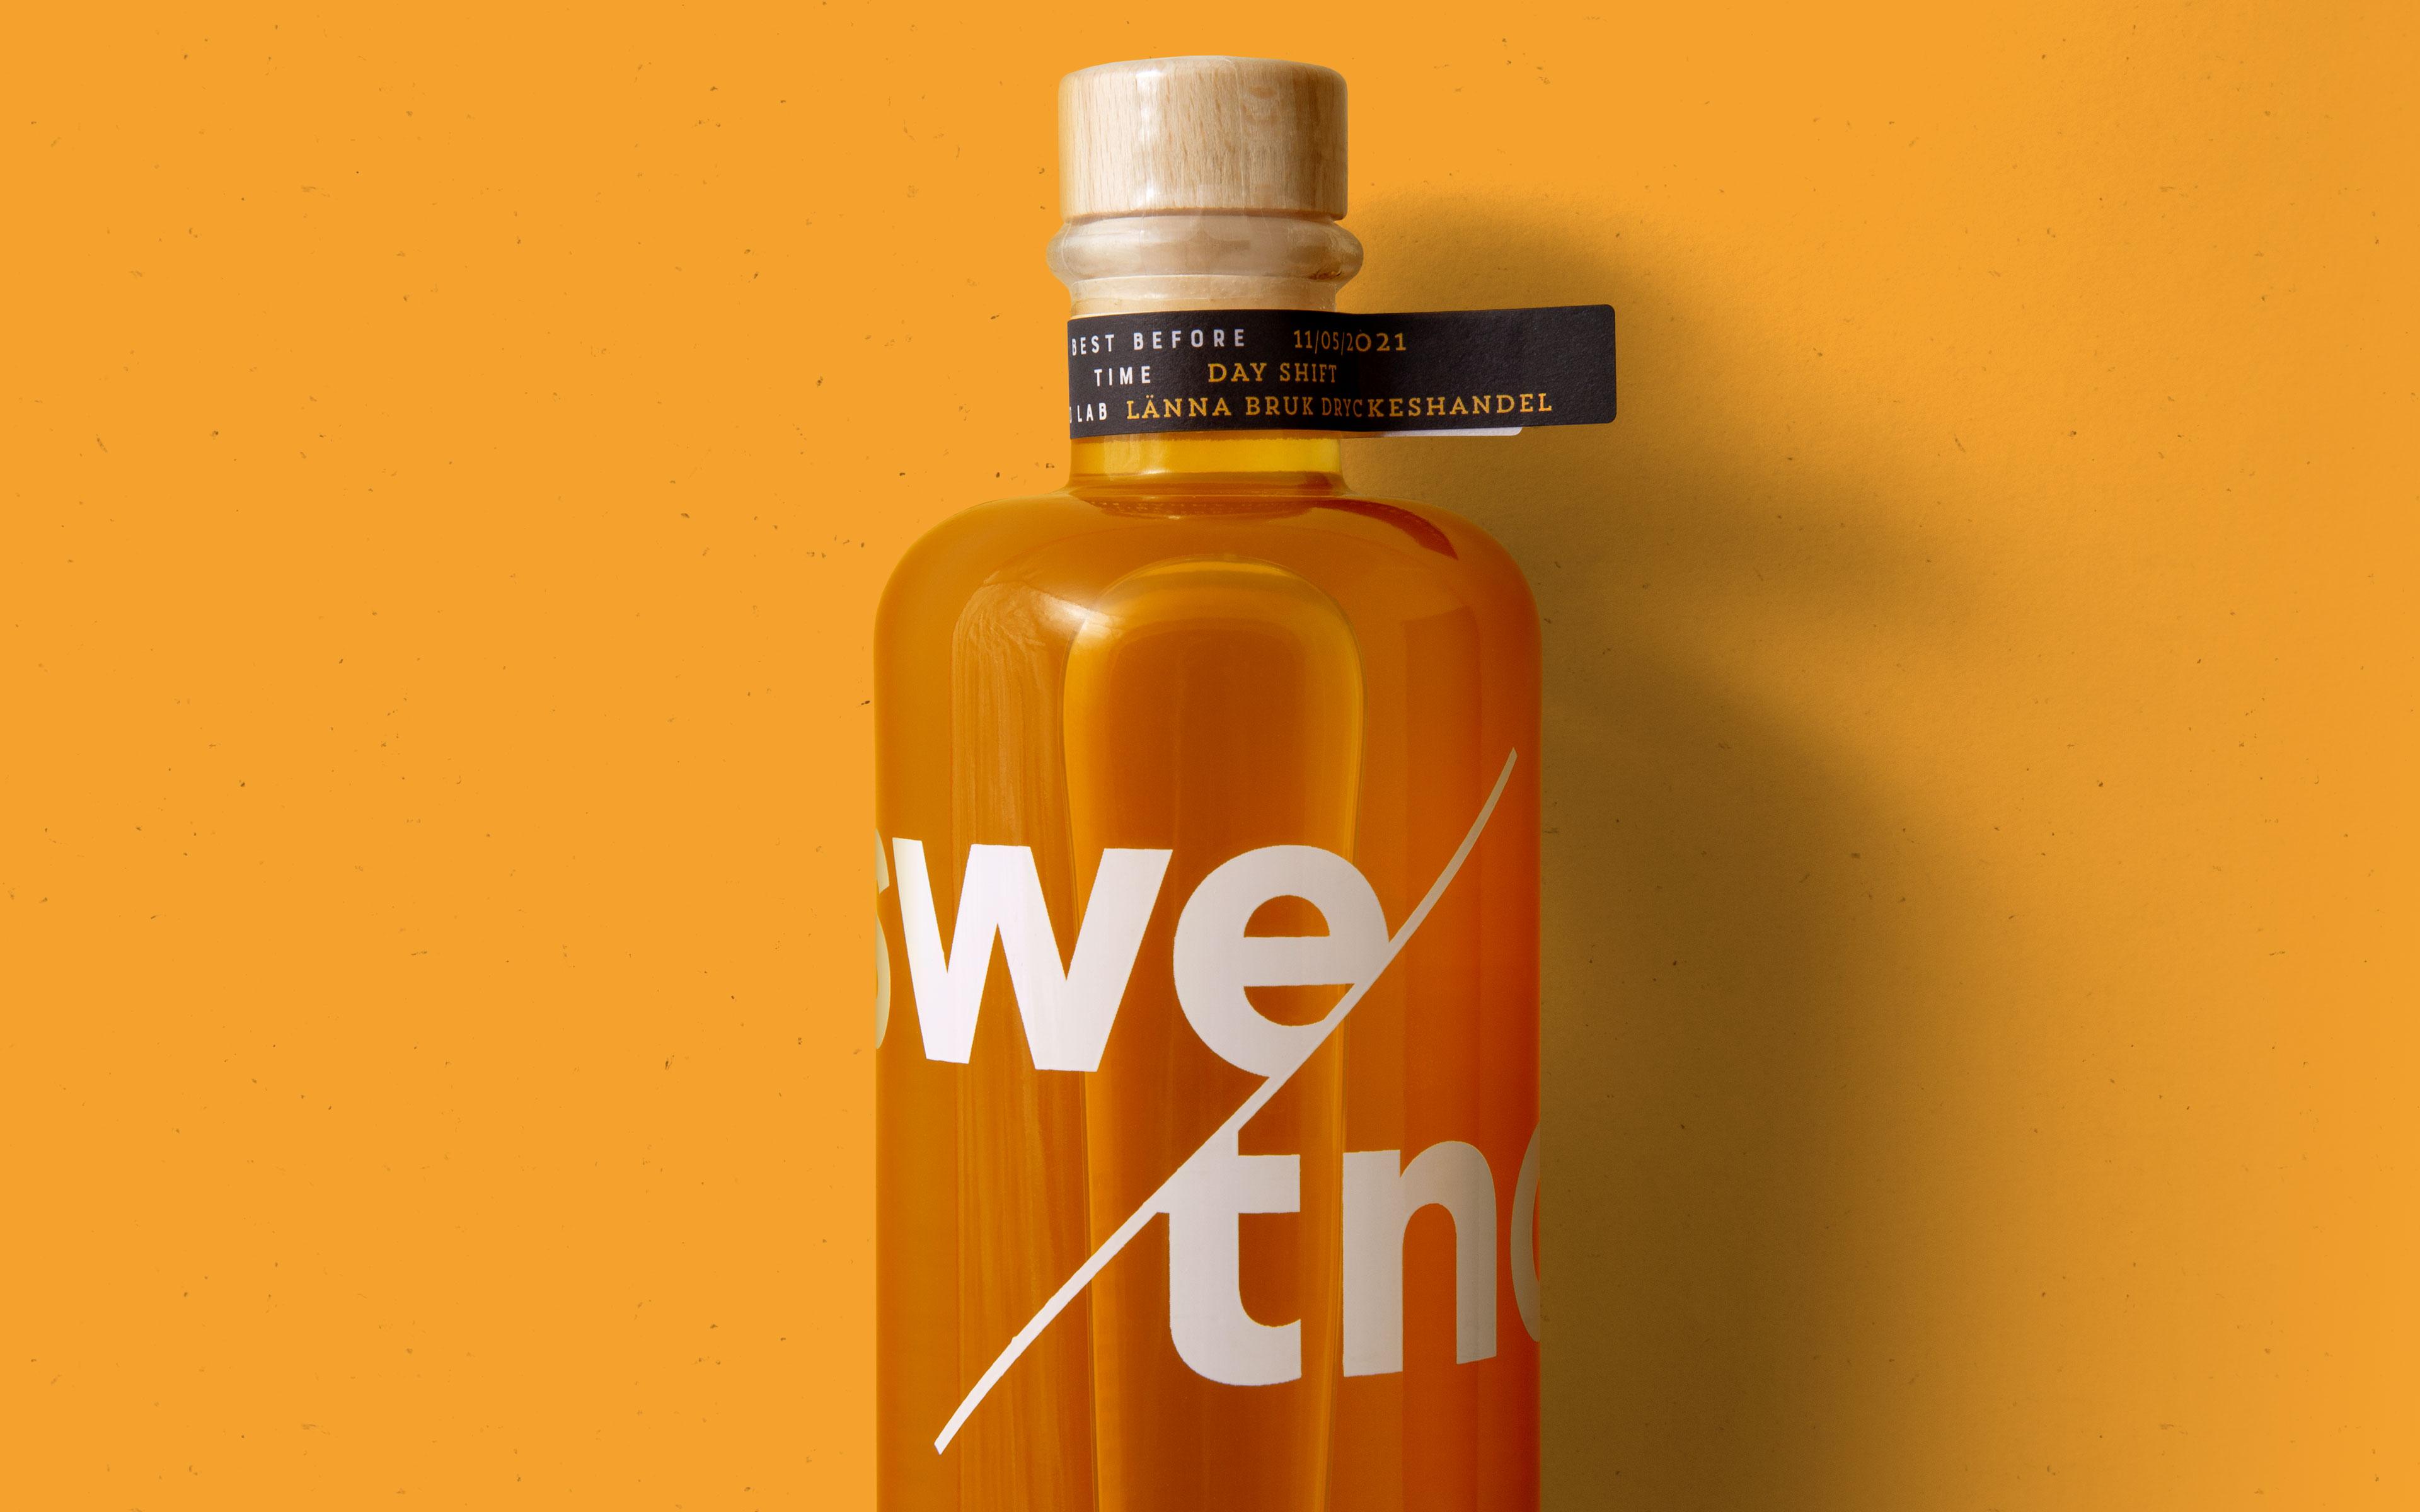 SWE/TNC – A Hand-Brewed Swedish Gin & Tonic Glögg